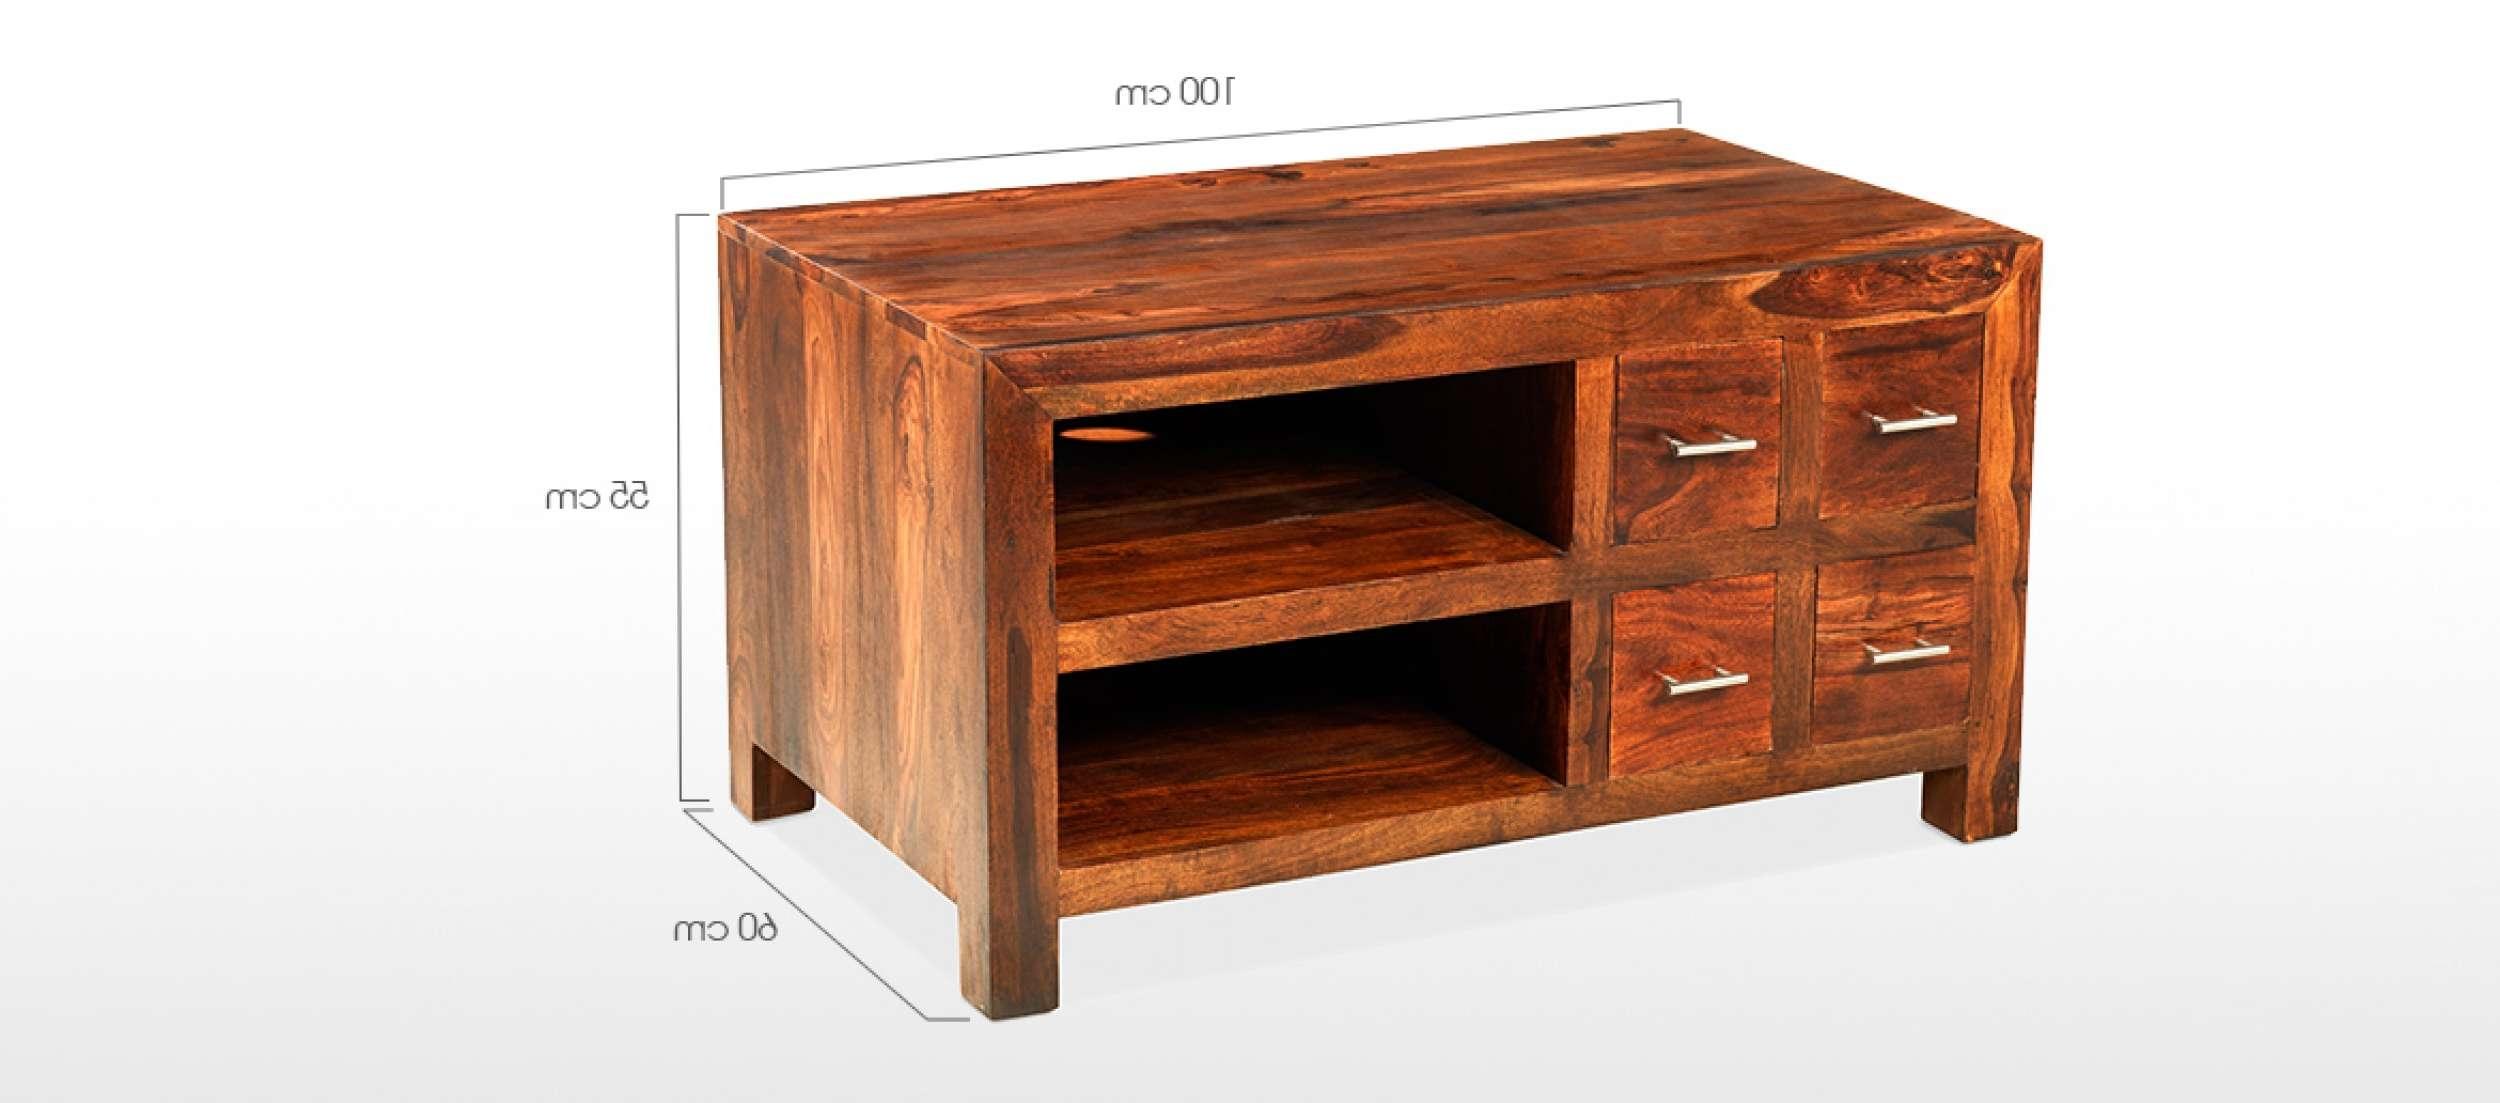 Cube Sheesham Tv Cabinet | Quercus Living Inside Sheesham Tv Stands (View 14 of 15)